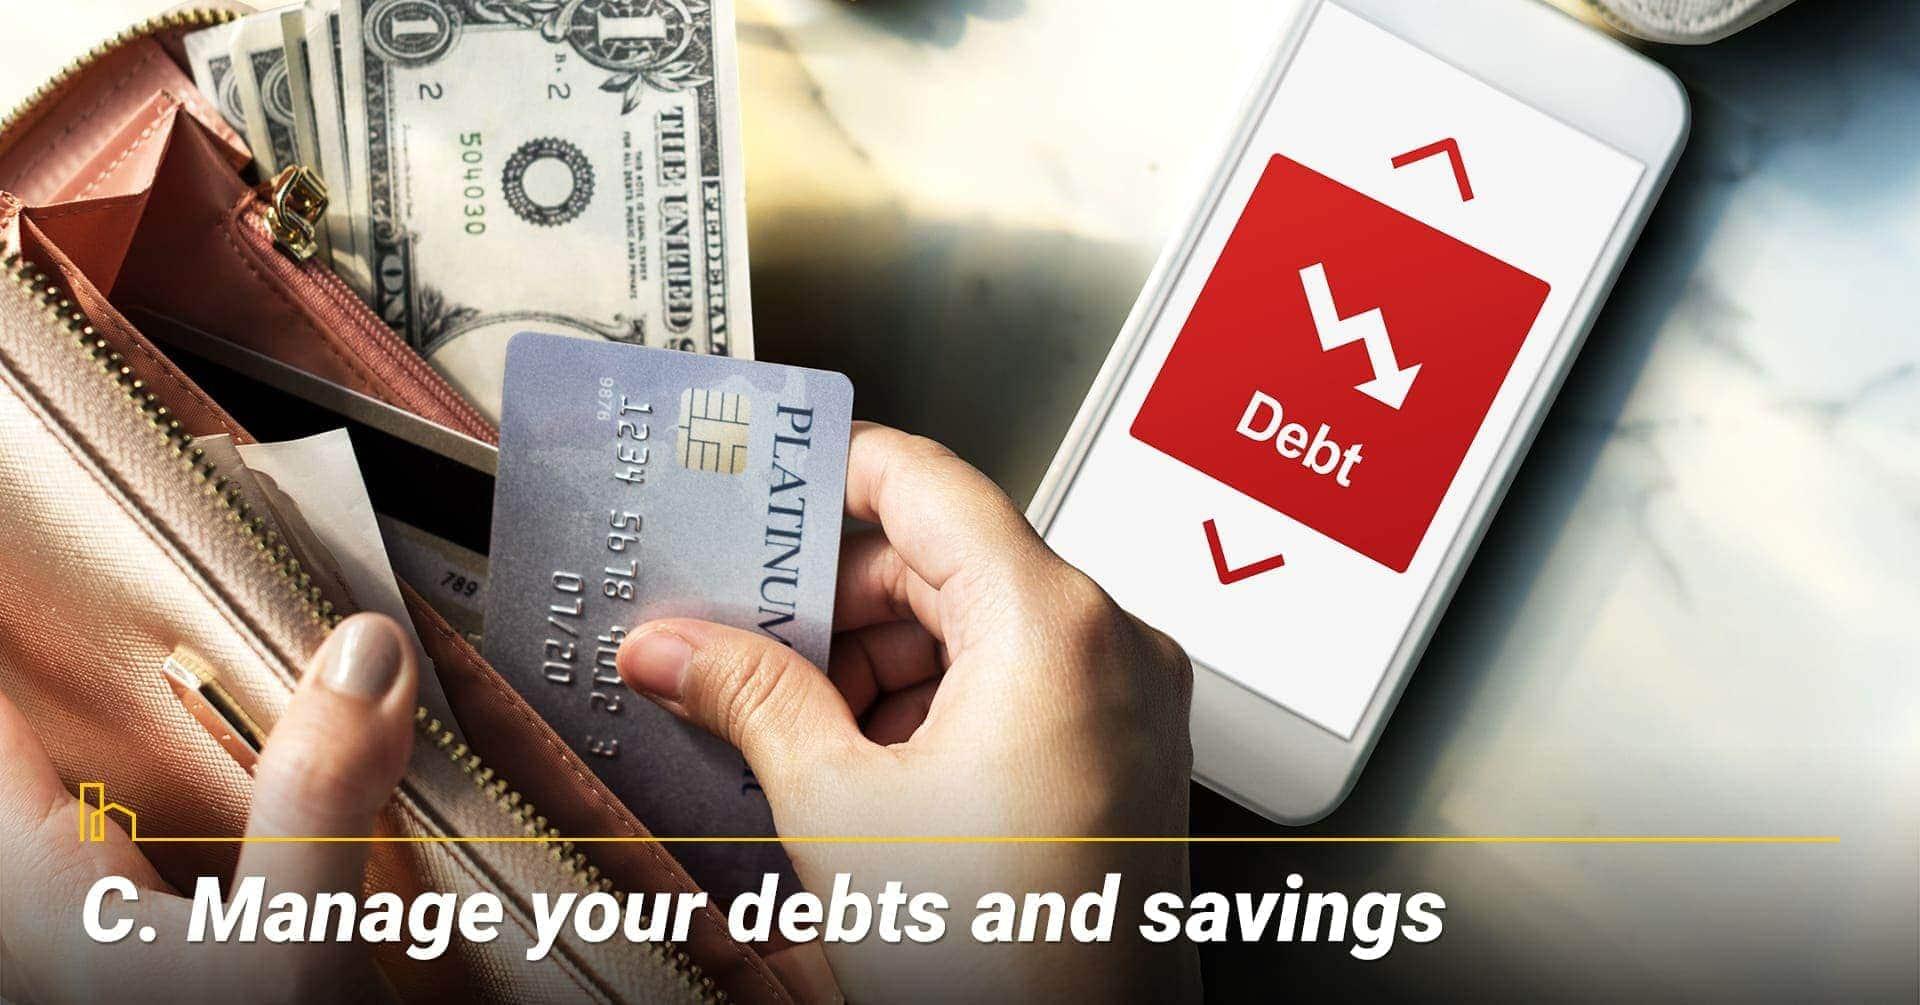 Manage your debts and savings, reduce debts and increase savings